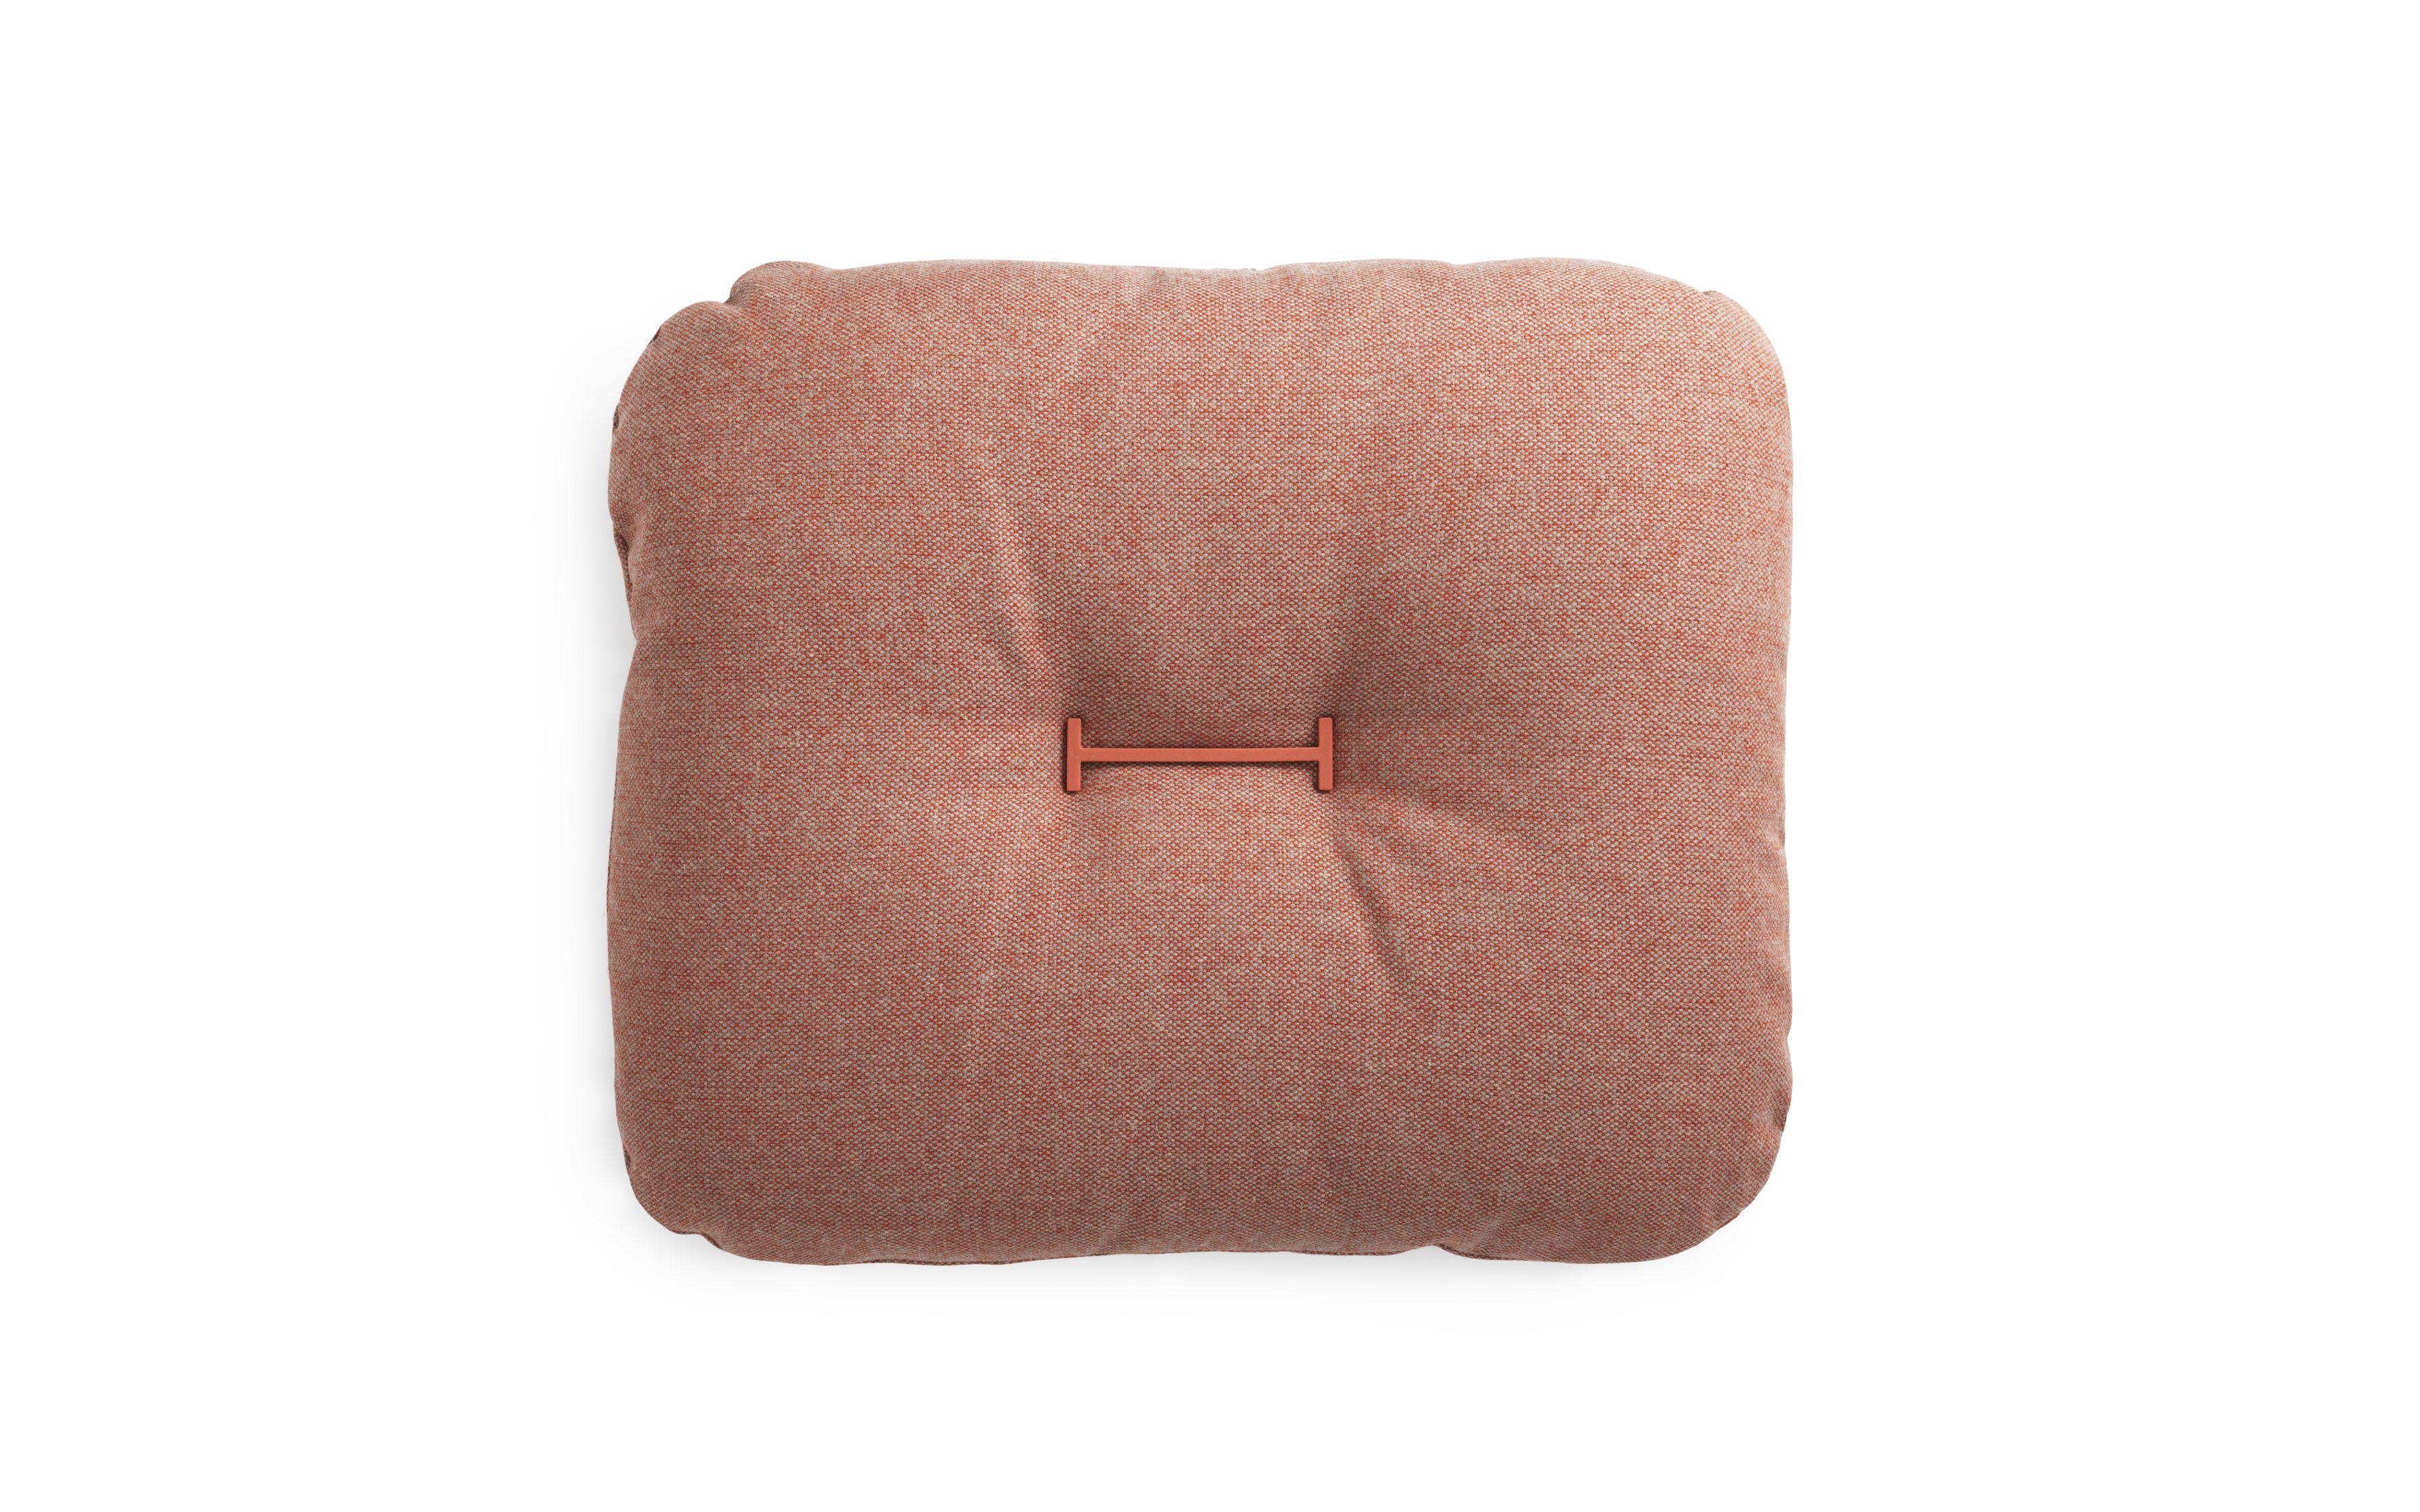 Groovy Hi Cushion In Rust Colorer Flax By Normann Copenhagen Pink Ibusinesslaw Wood Chair Design Ideas Ibusinesslaworg